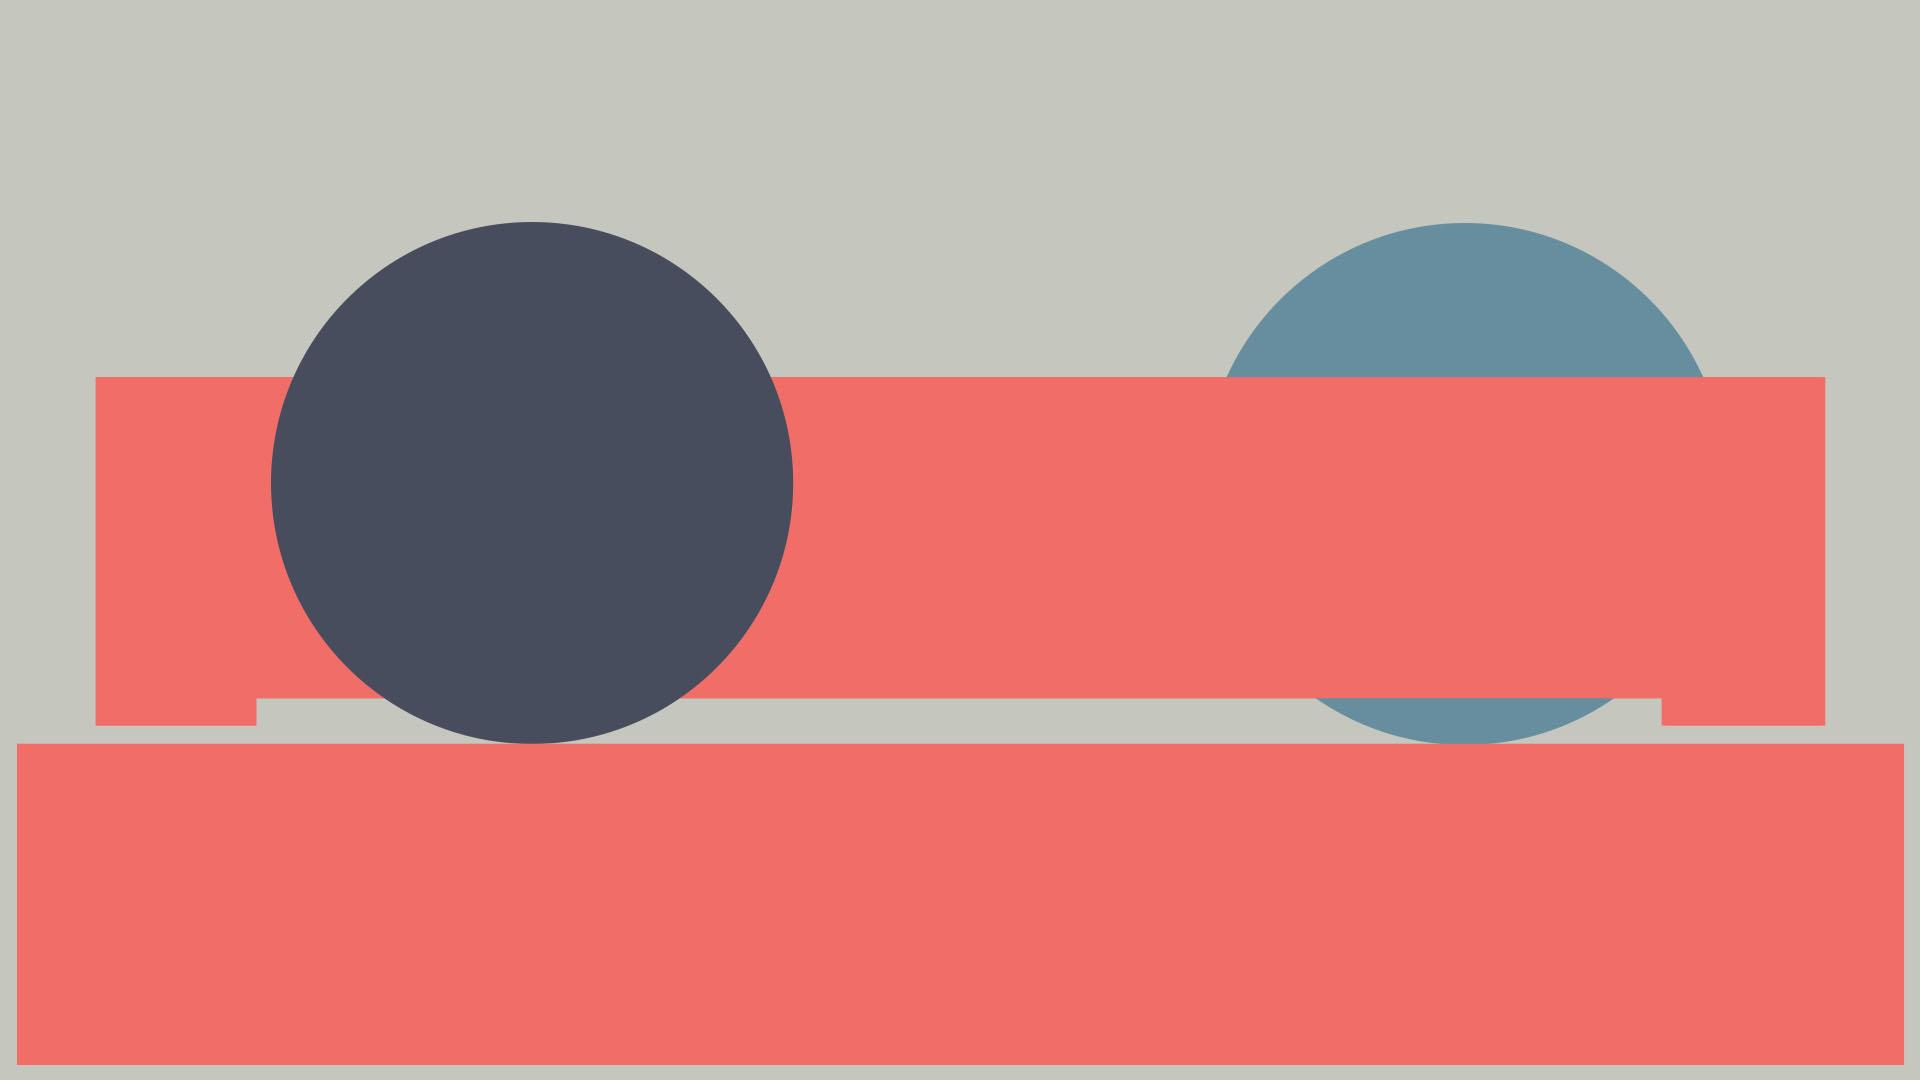 animatique maison corbeille v3_0022_47.jpg